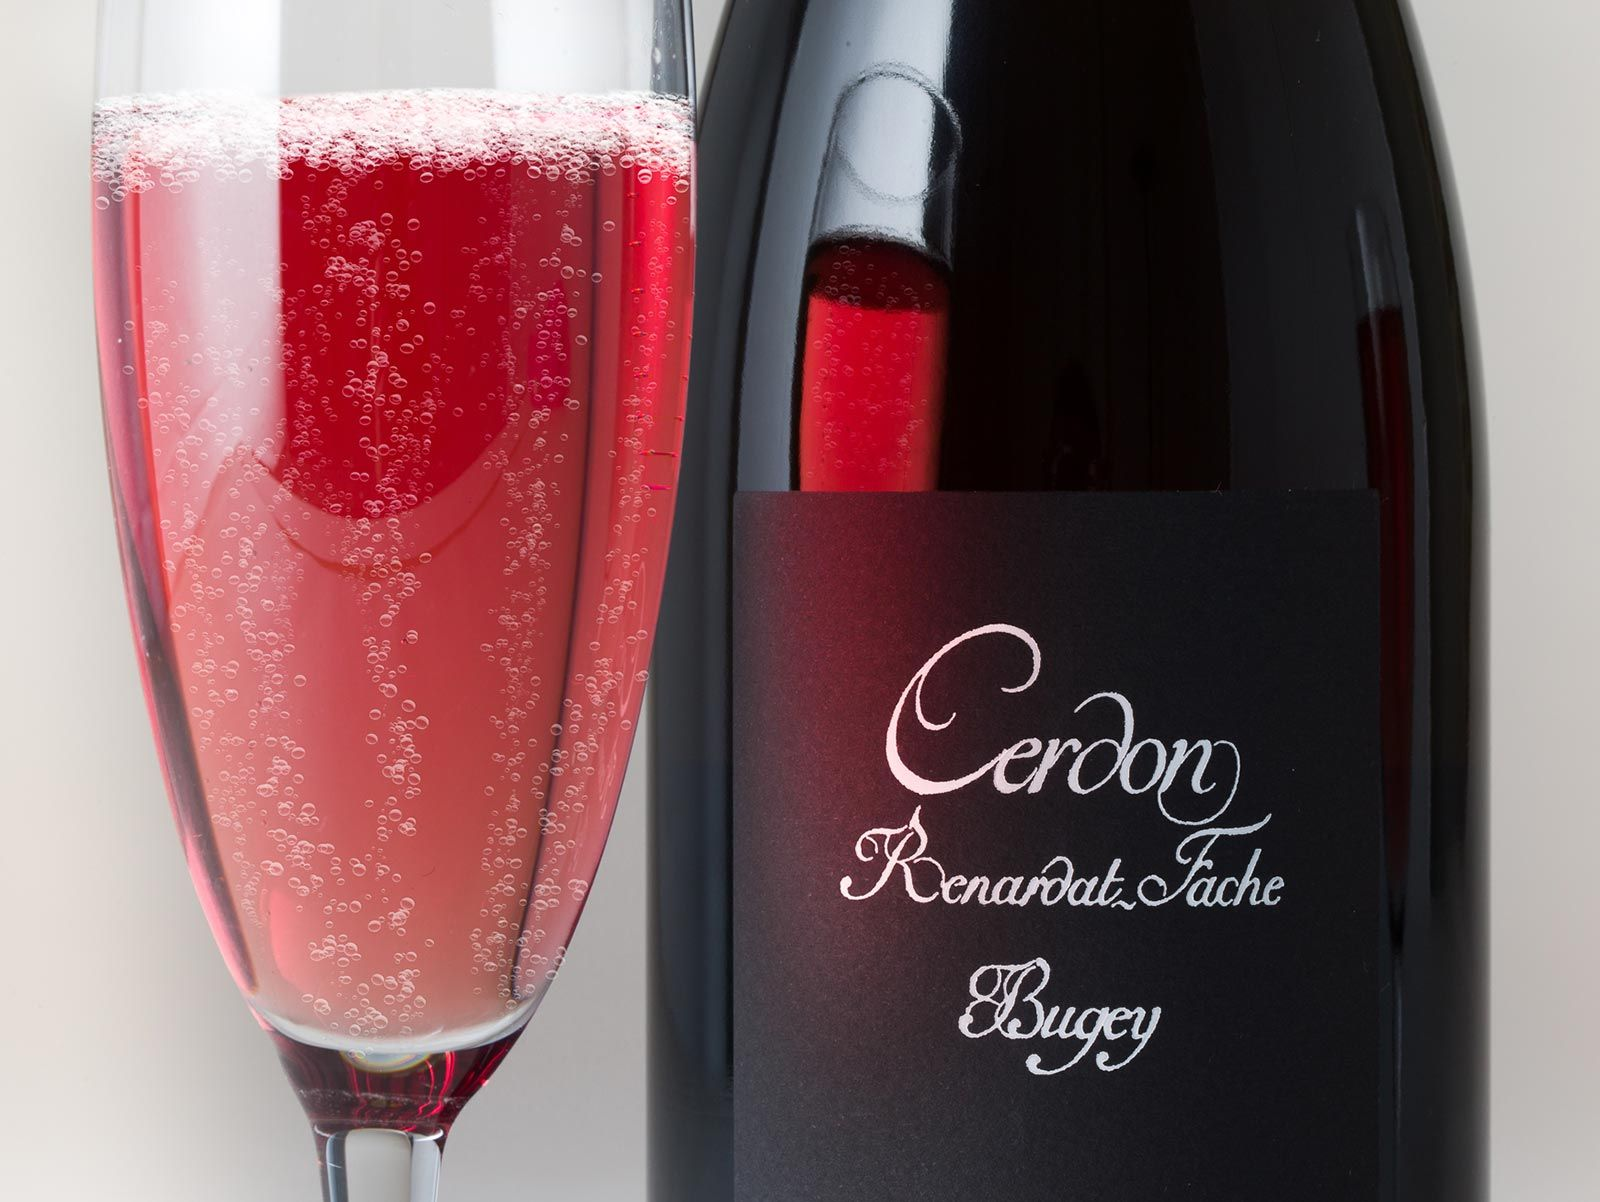 Cerdon Vin Effervescent Aoc Bugey Cerdon Vin Effervescent Vin Croque En Bouche